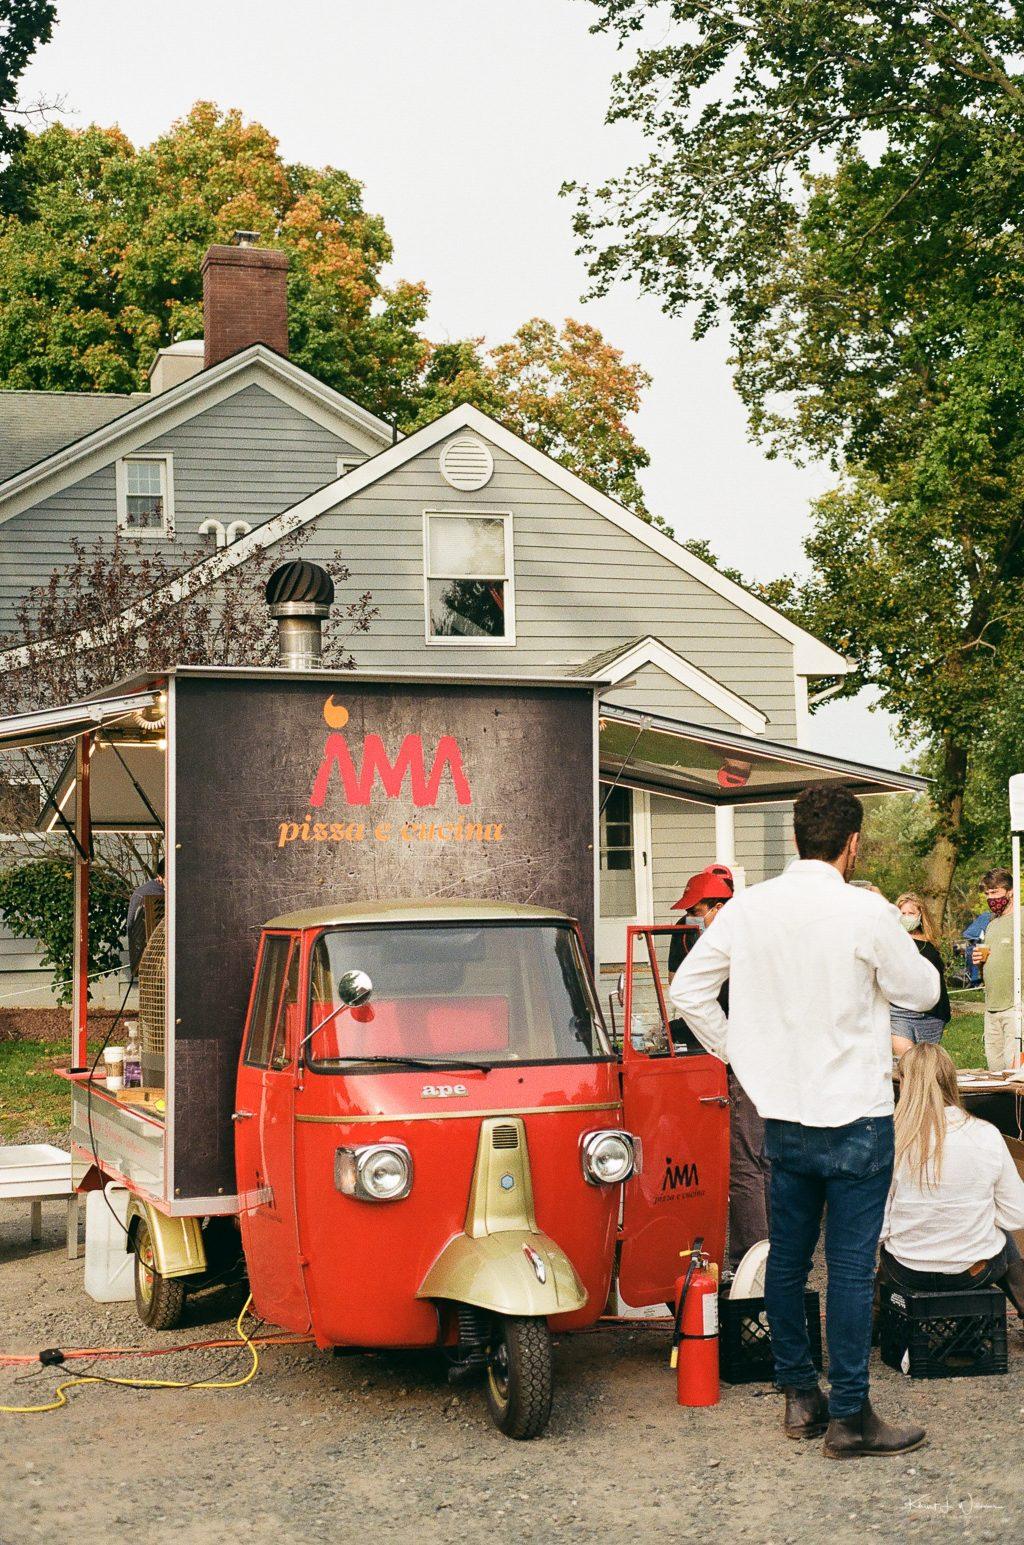 AMA Pizze e Cucina Truck | Minolta X-700 | Minolta MD Rokkor-X 45mm